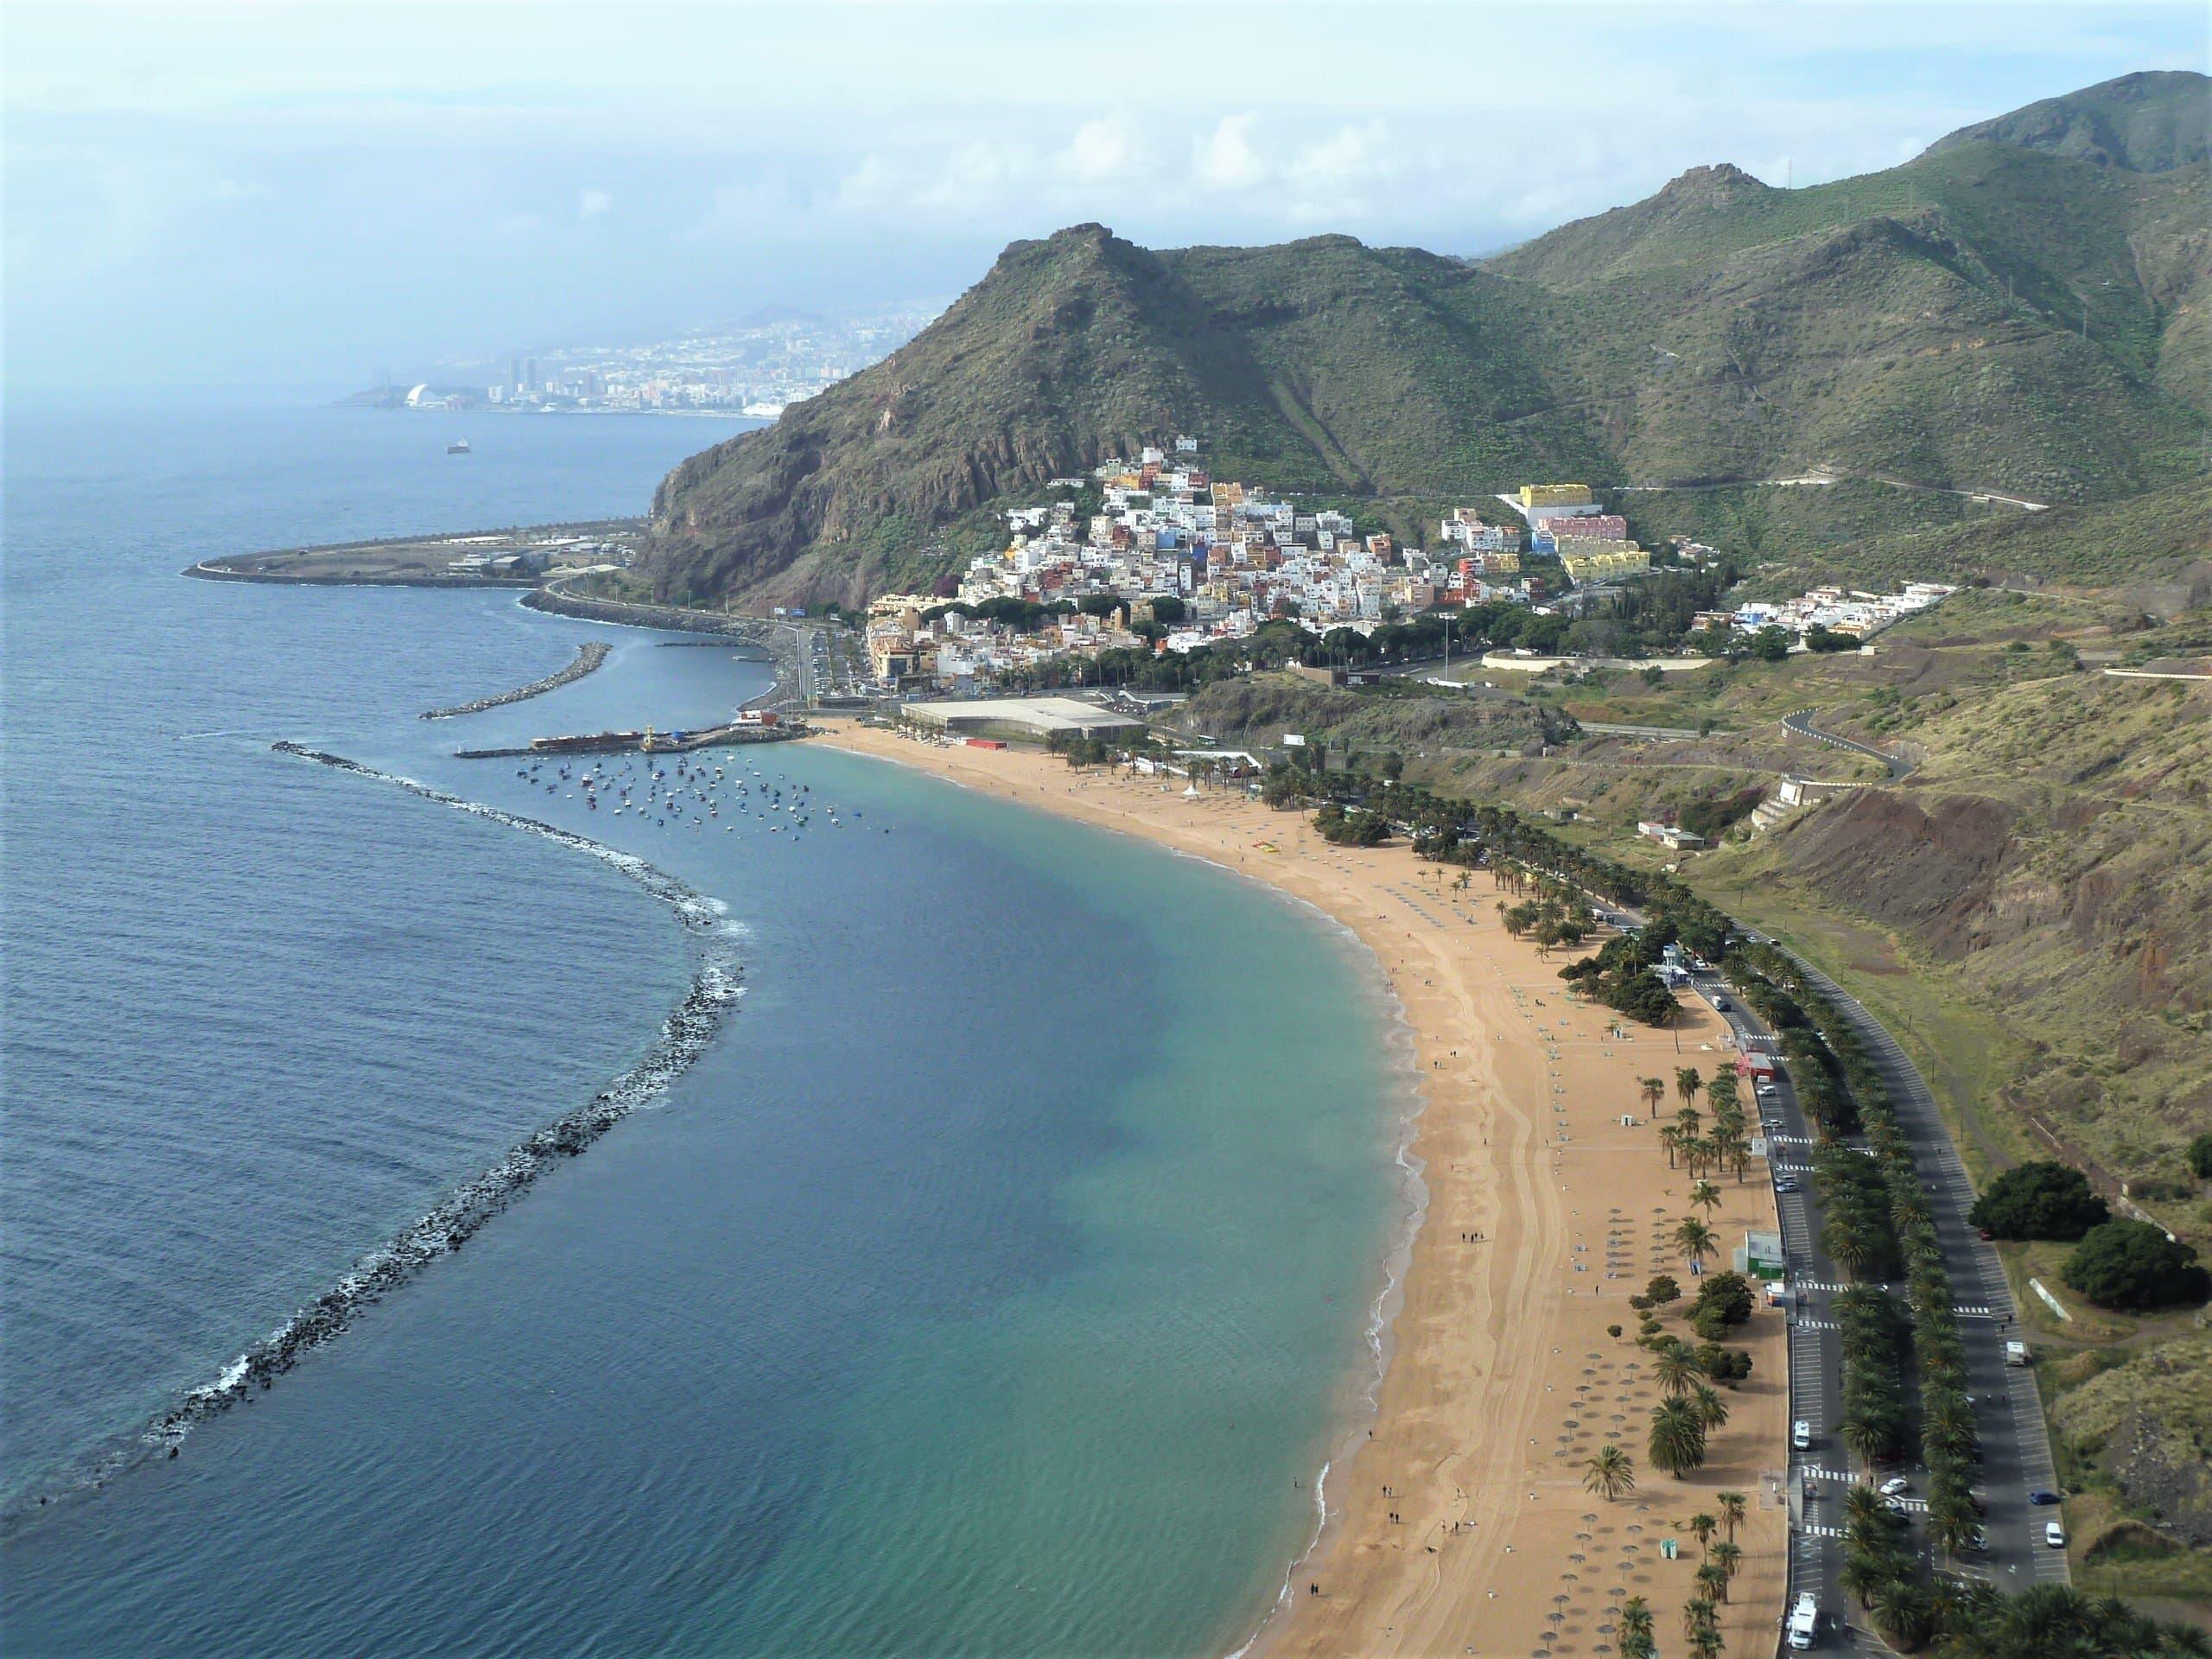 Der Strand de las Teresitas